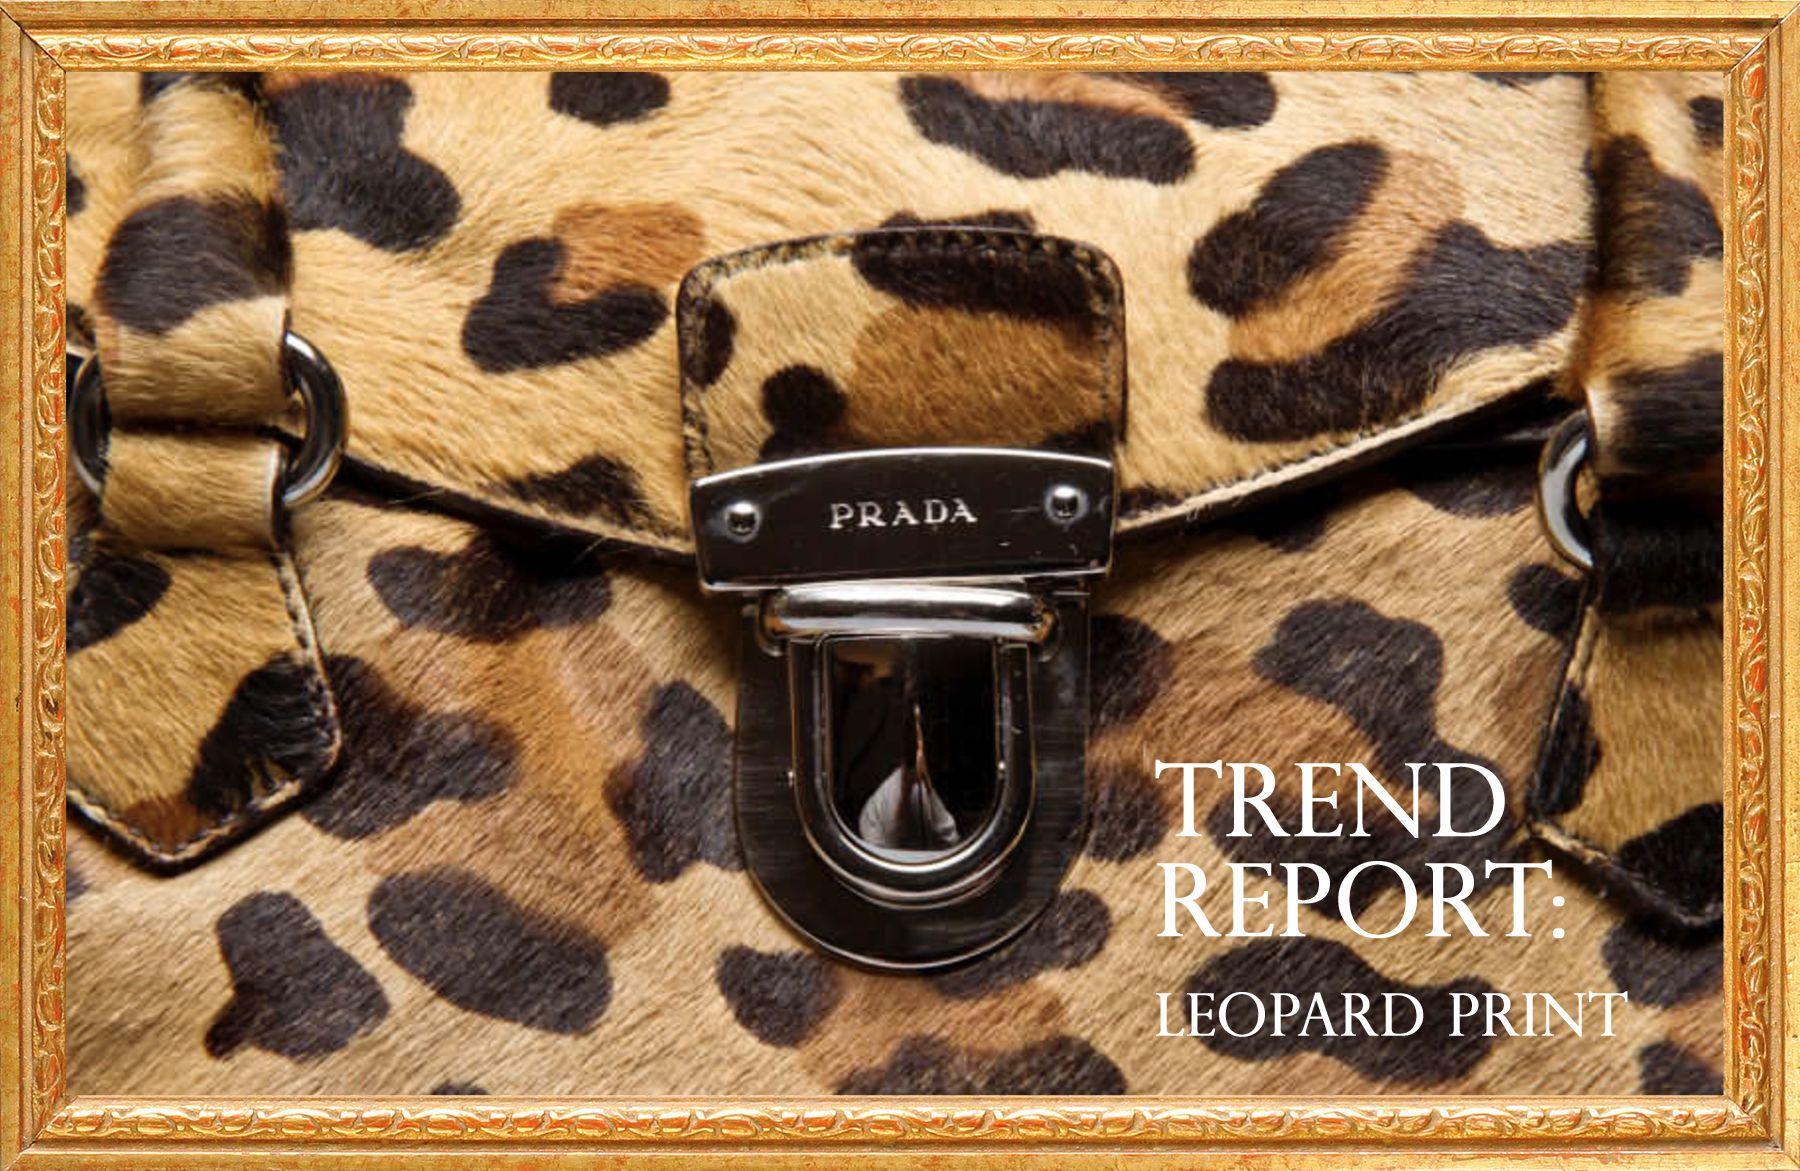 leopard print.jpg